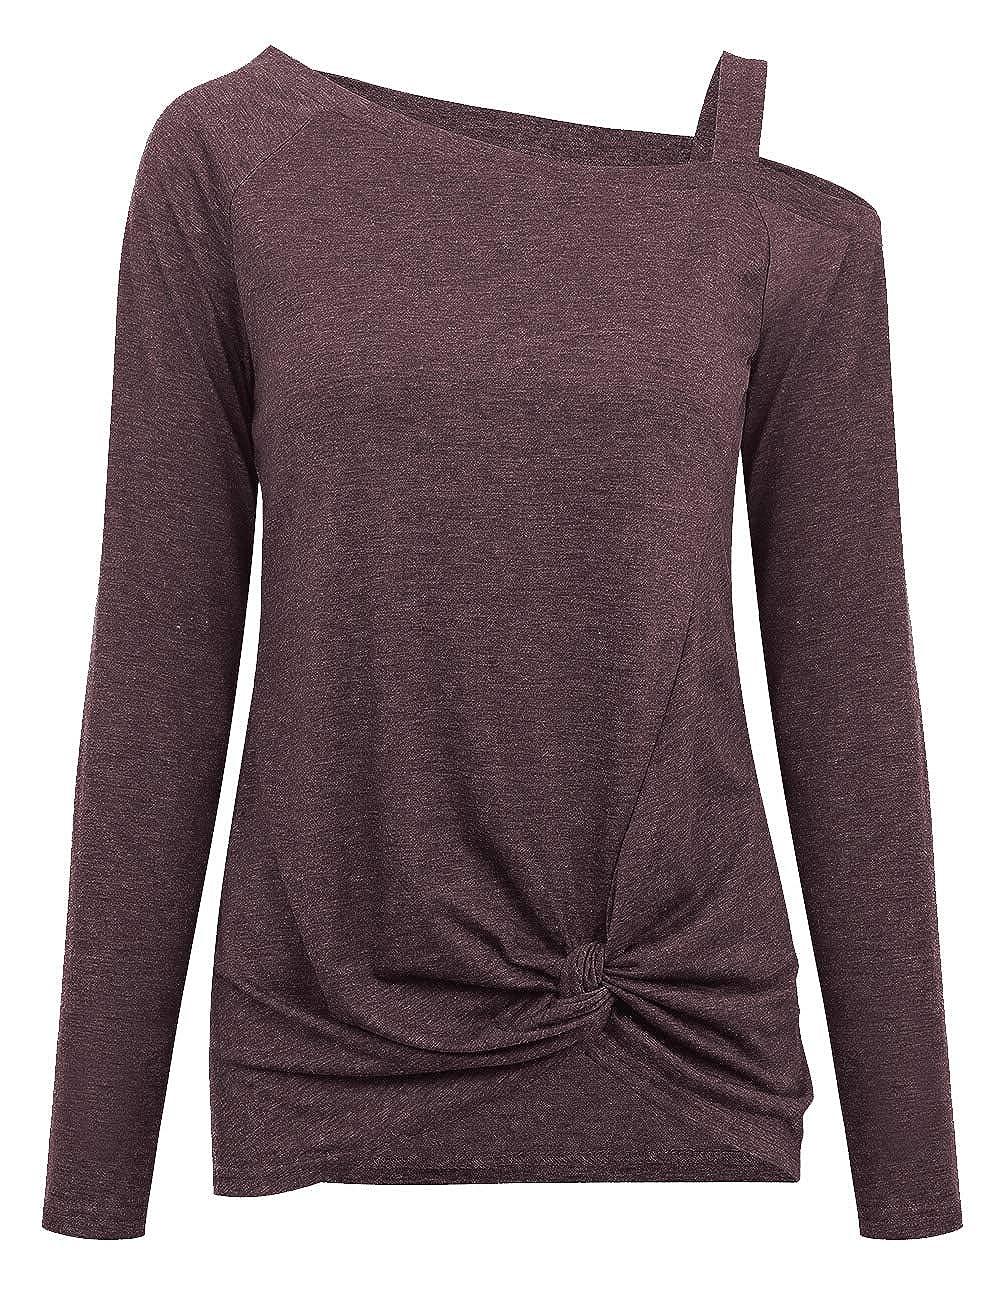 Martiount Camiseta Blusa Manga Larga Mujer Hombro Fr/ío Camisa Cuello Redondo Oto/ño Shirt Elegante Vintage Tops Casual Sweatshirt B/ásico in Algod/ón Side Twist Knot Pullover T-Shirt